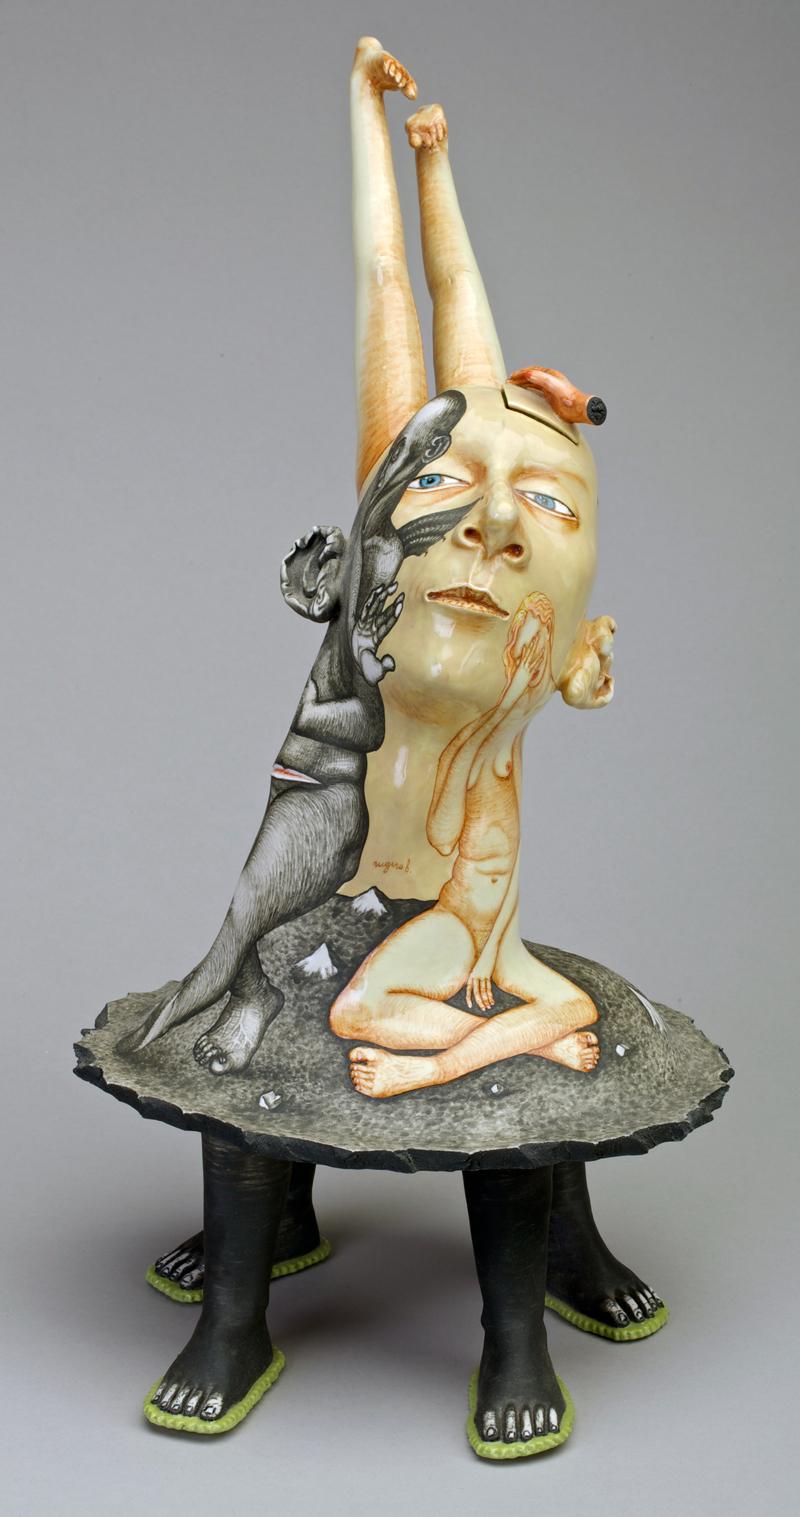 "Sergei Isupov, ""Never the Same"" 1997, porcelain, glaze, stain, 16 x 8.5 x 11.5"". Collection of Racine Art Museum, Racine, WI."